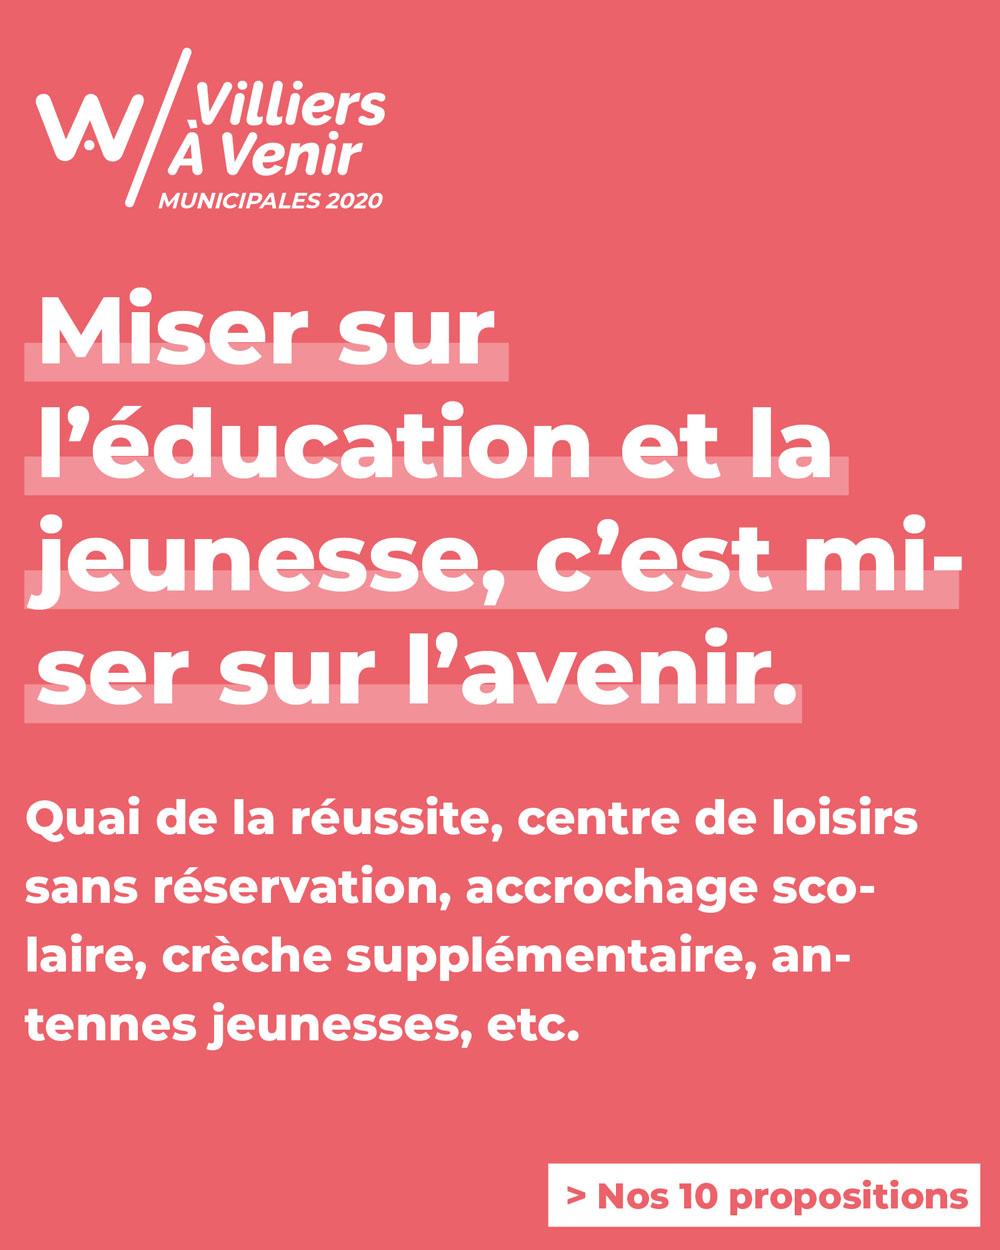 http://vav94.fr/wp-content/uploads/2020/02/PROGRAMME-VILLIERS-A-VENIR-VAV-94-EDUCATION-JEUNESSE-MUNICIPALES-2020-VILLIERS-SUR-MARNE.jpg